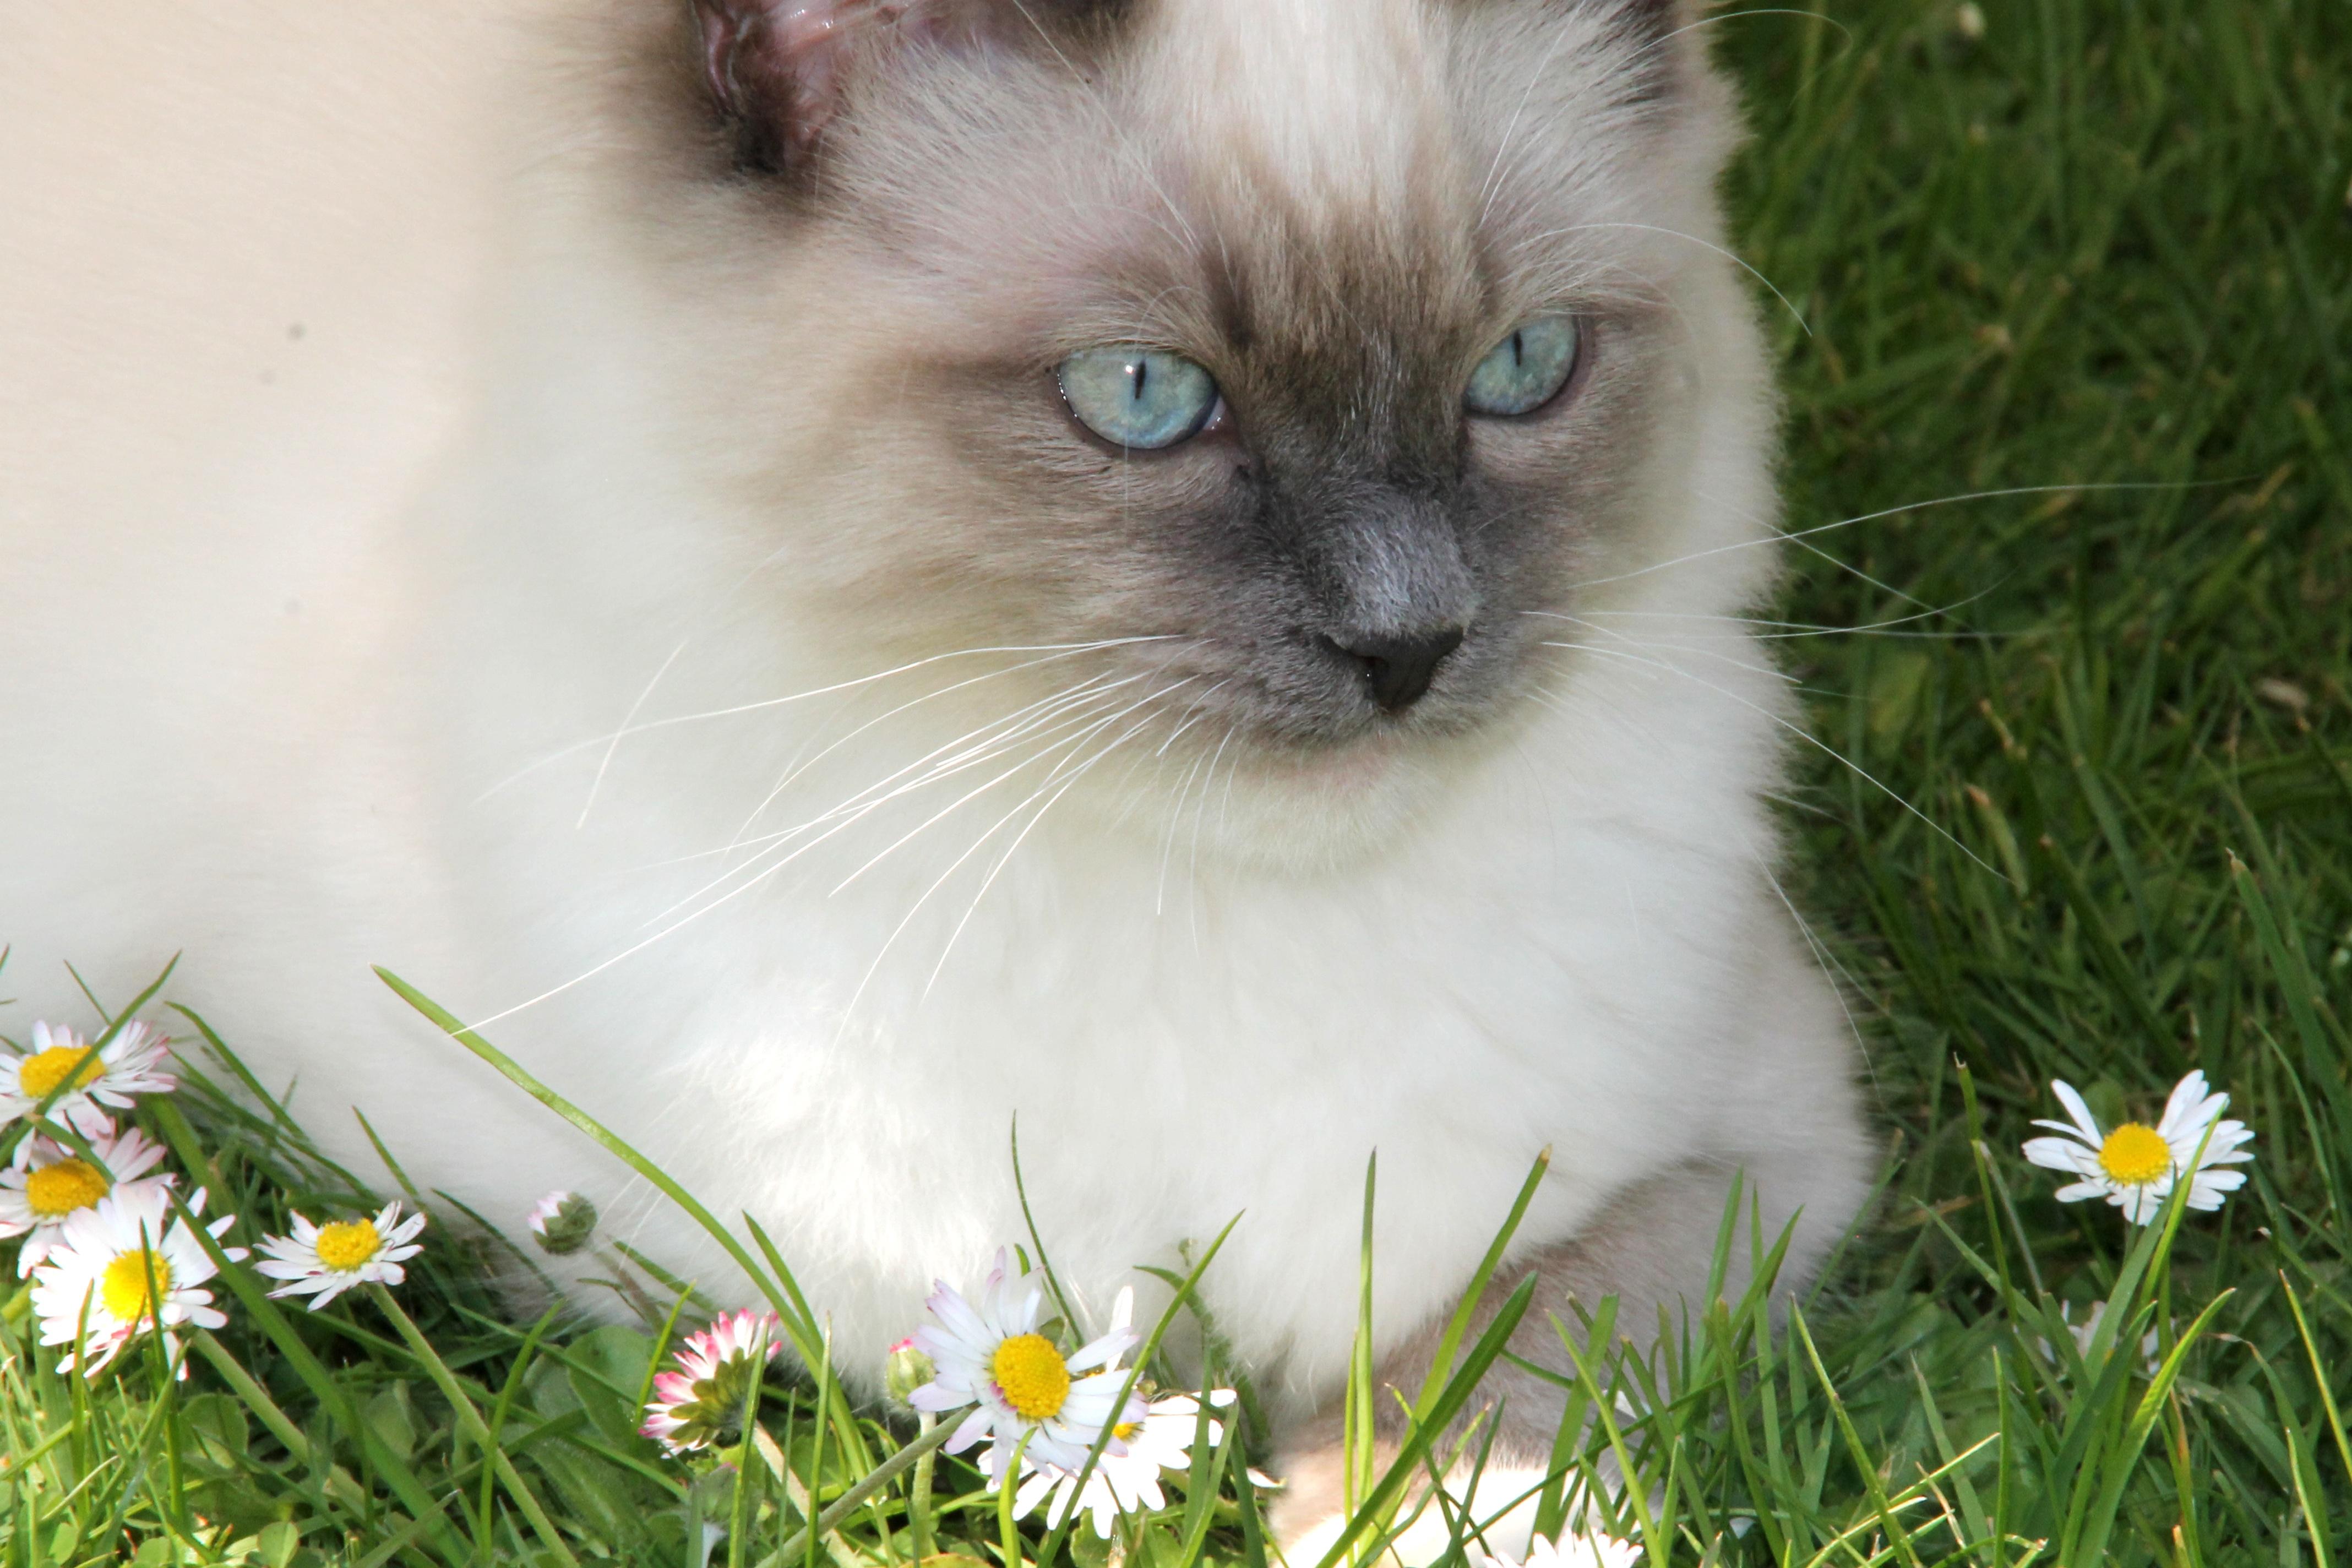 free images   grass  daisy  portrait  kitten  fauna  whiskers  adidas  animals  vertebrate